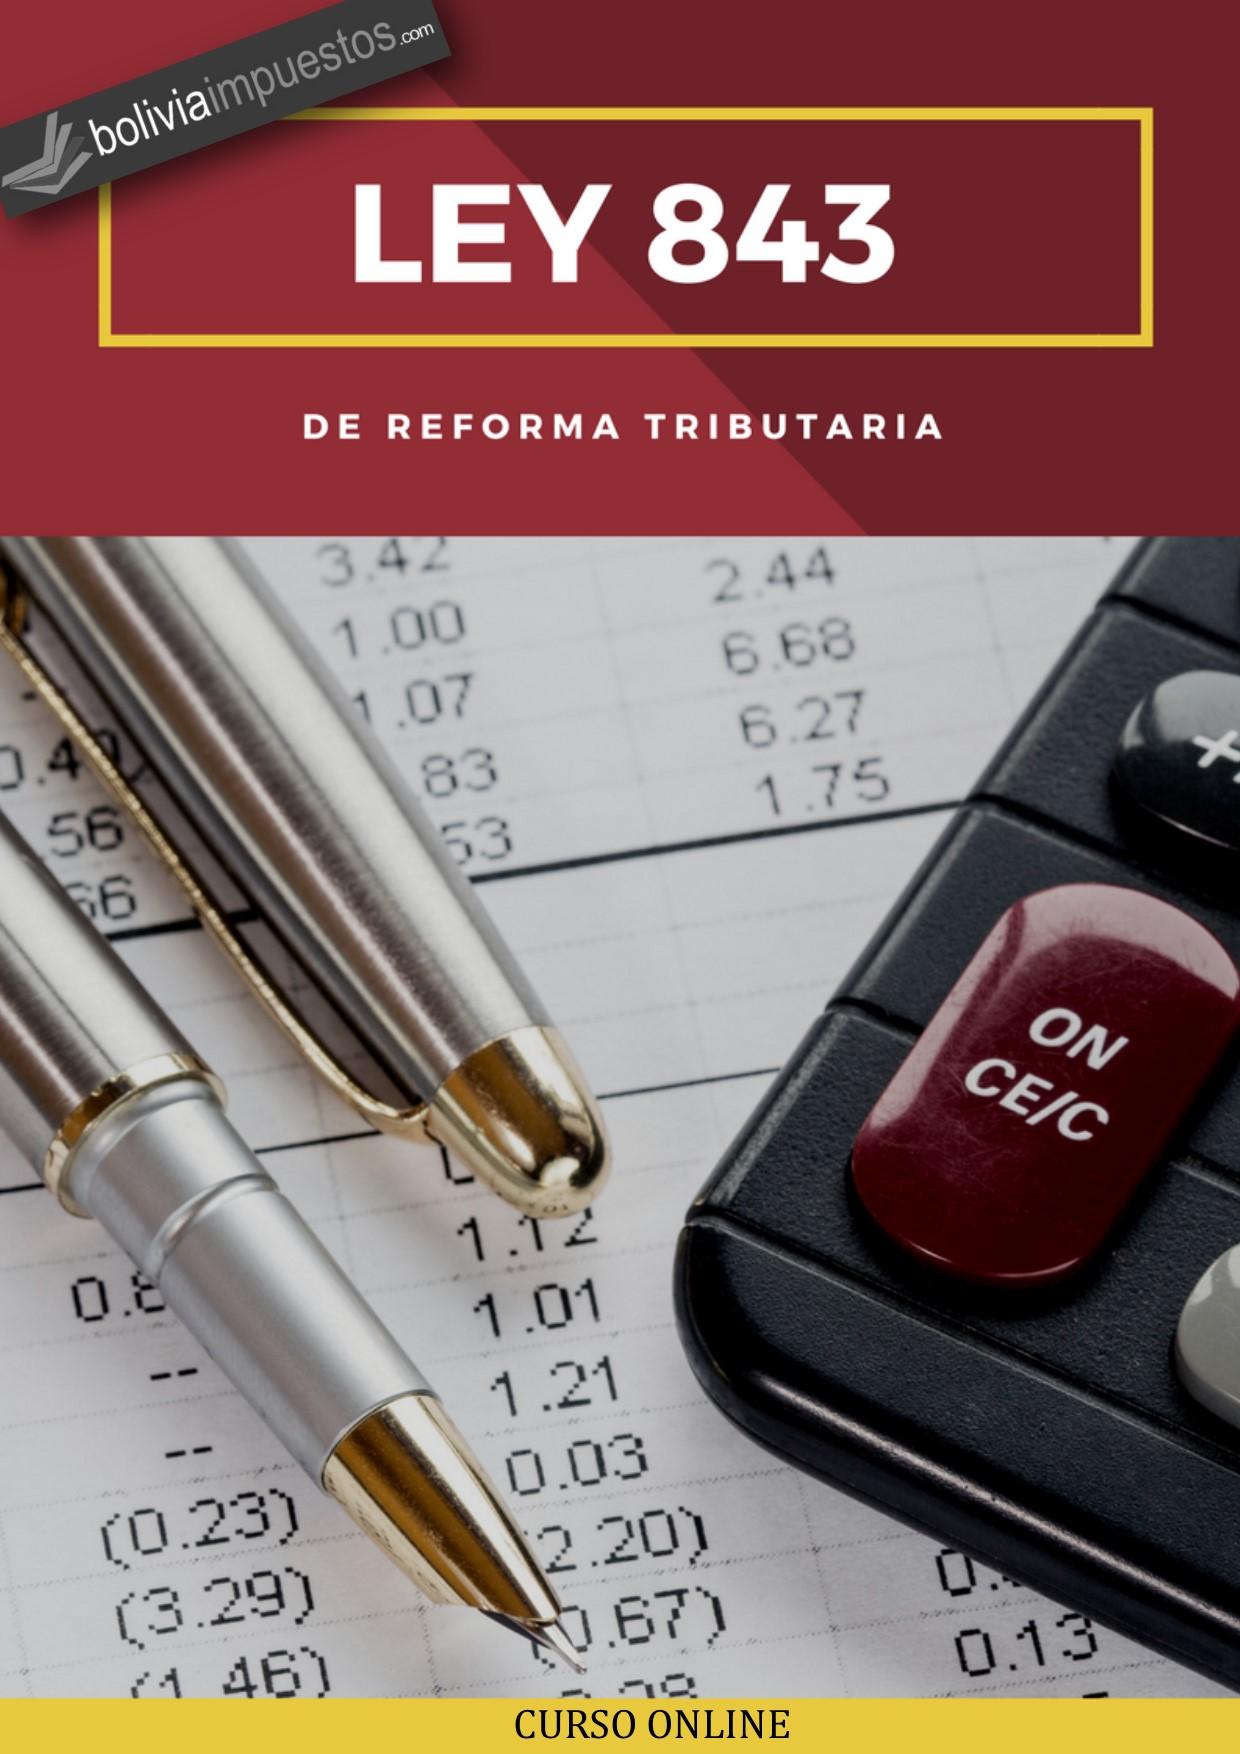 ley 843 bolivia curso